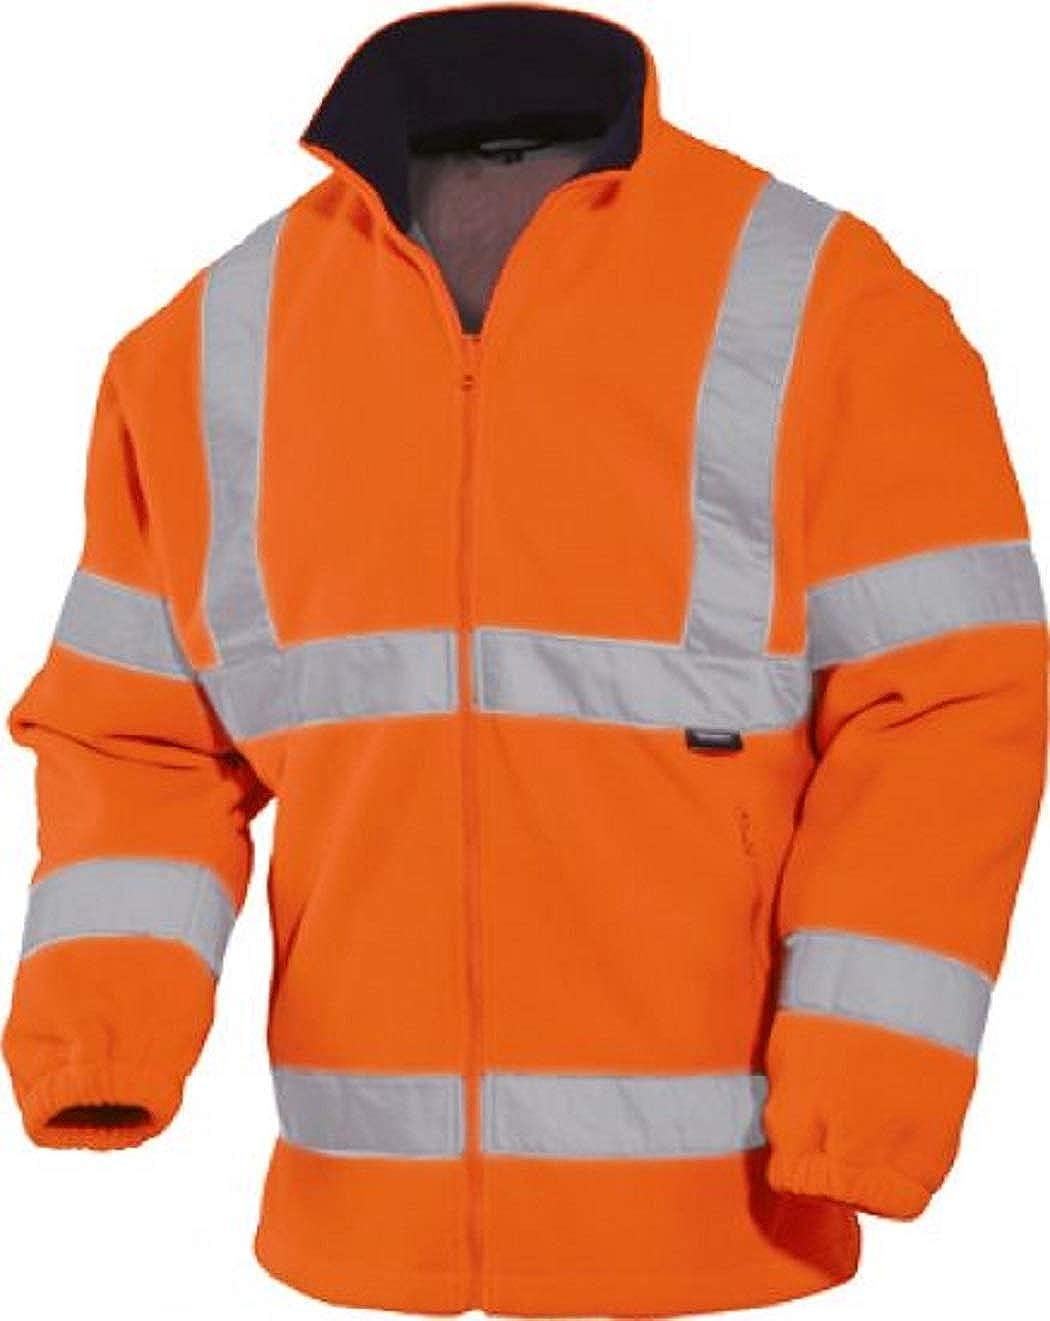 Warnschutz-Fleecejacke Warnfleecejacke Premium Polarfleece orange oder gelb Gr.S-3XL vizwell